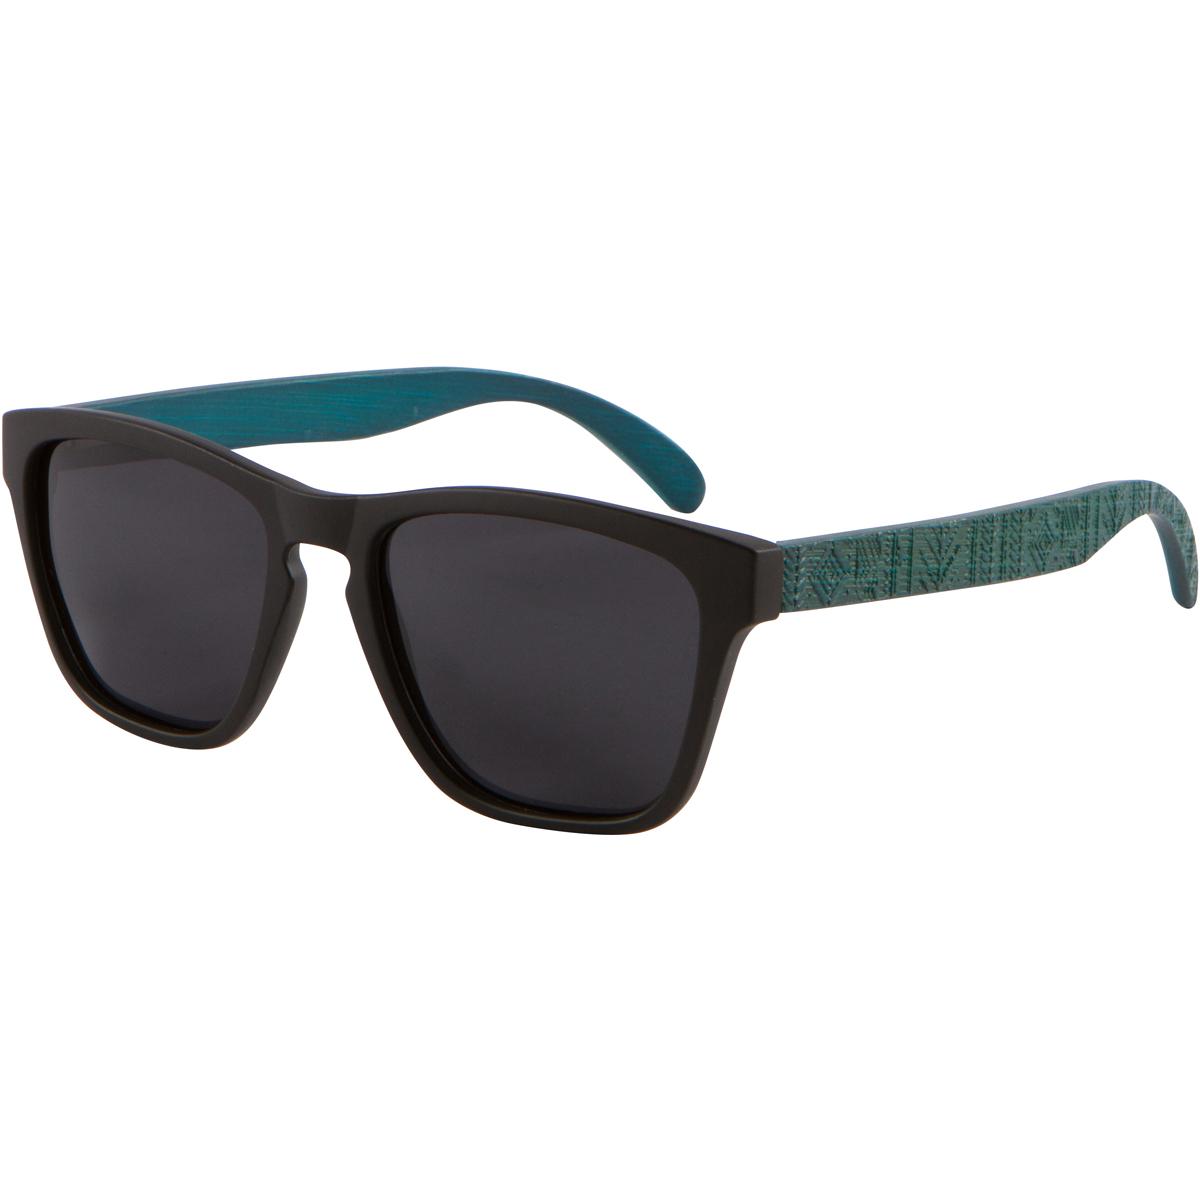 ee525ce6bc7 Blue Bamboo Wood Sunglasses